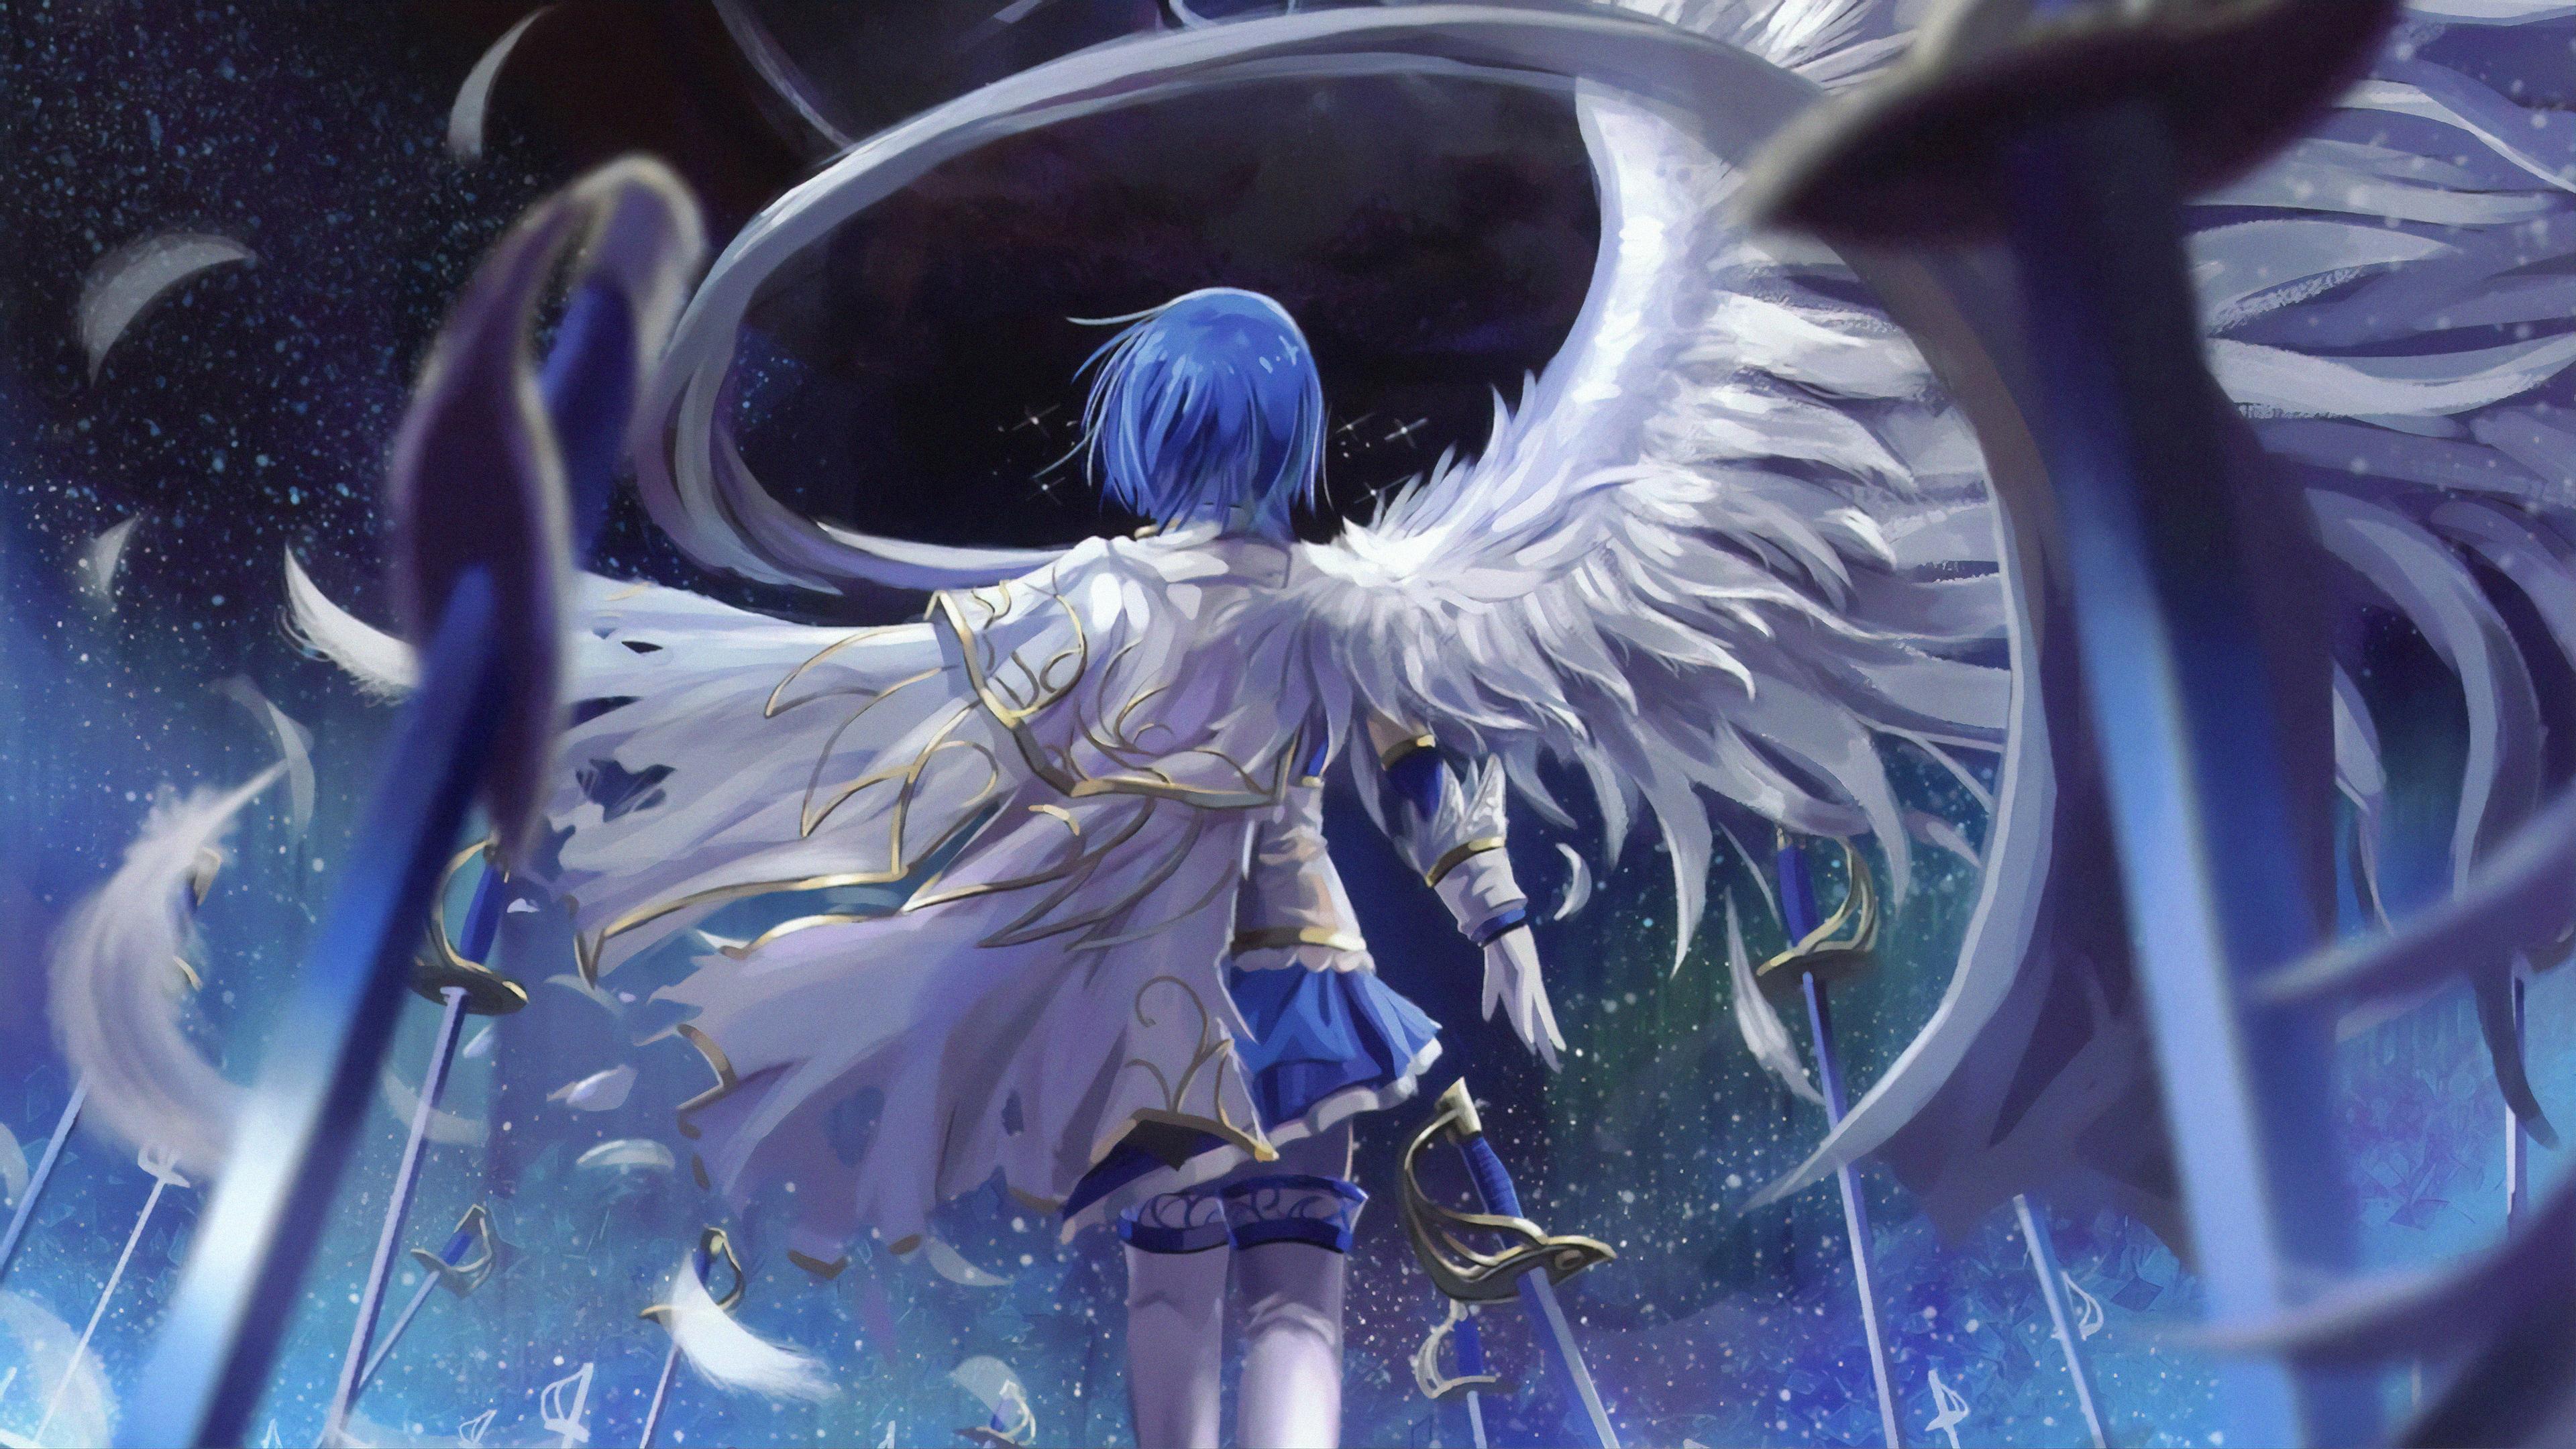 3840x2160 Mahou Shoujo Madoka Magica Blue Hair Anime 4k 4k Hd 4k